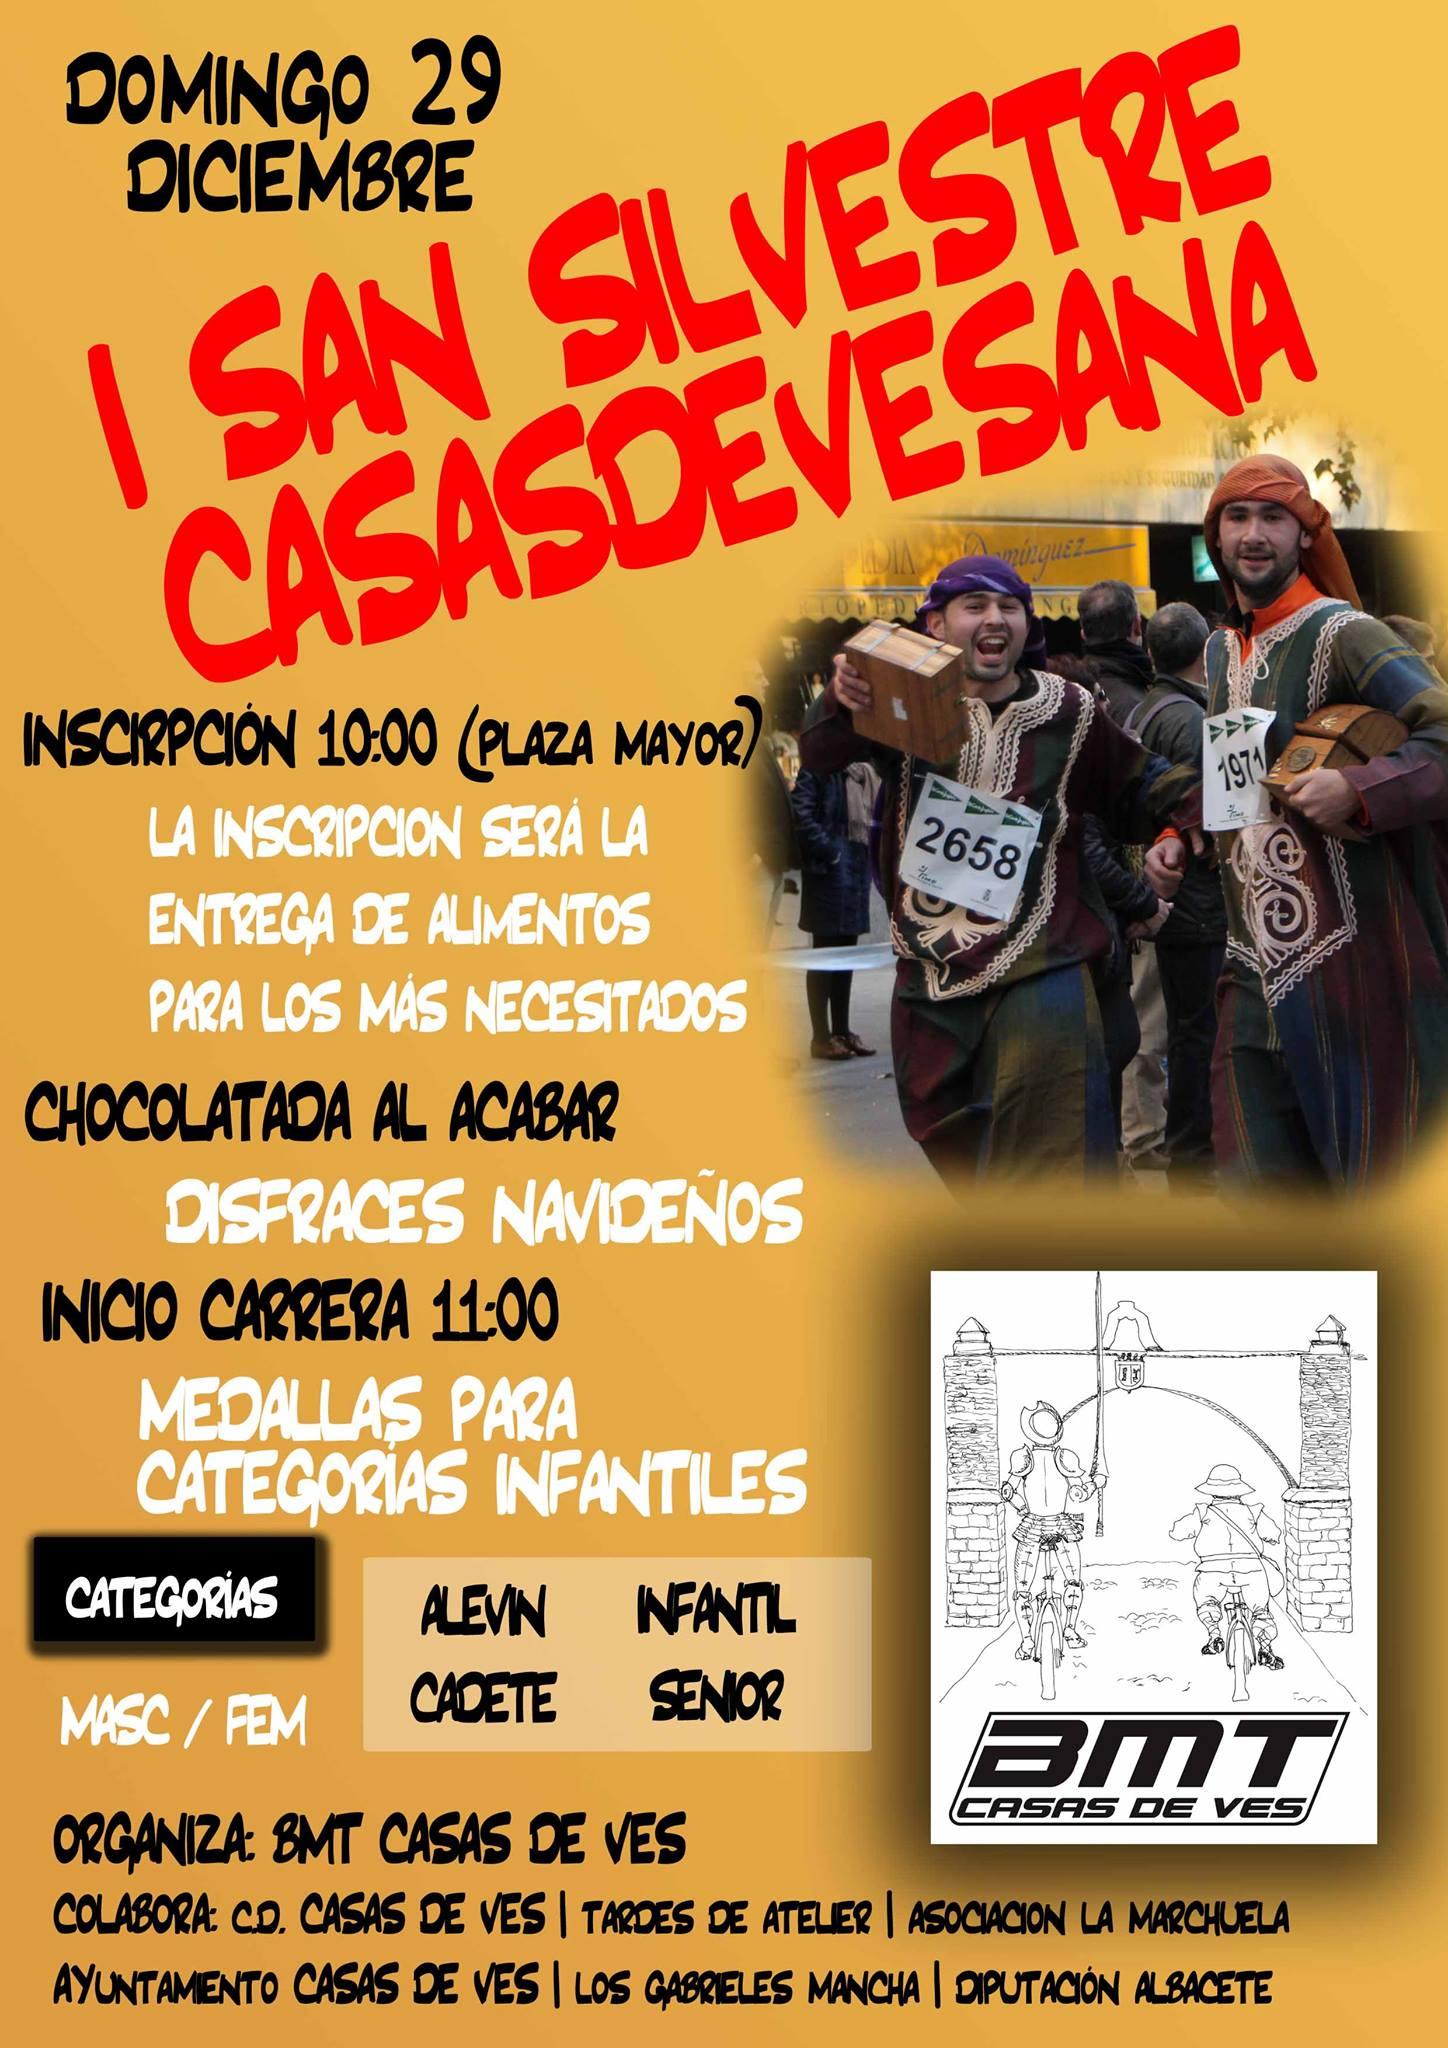 Cartel Casas de Ves I San Silvestre